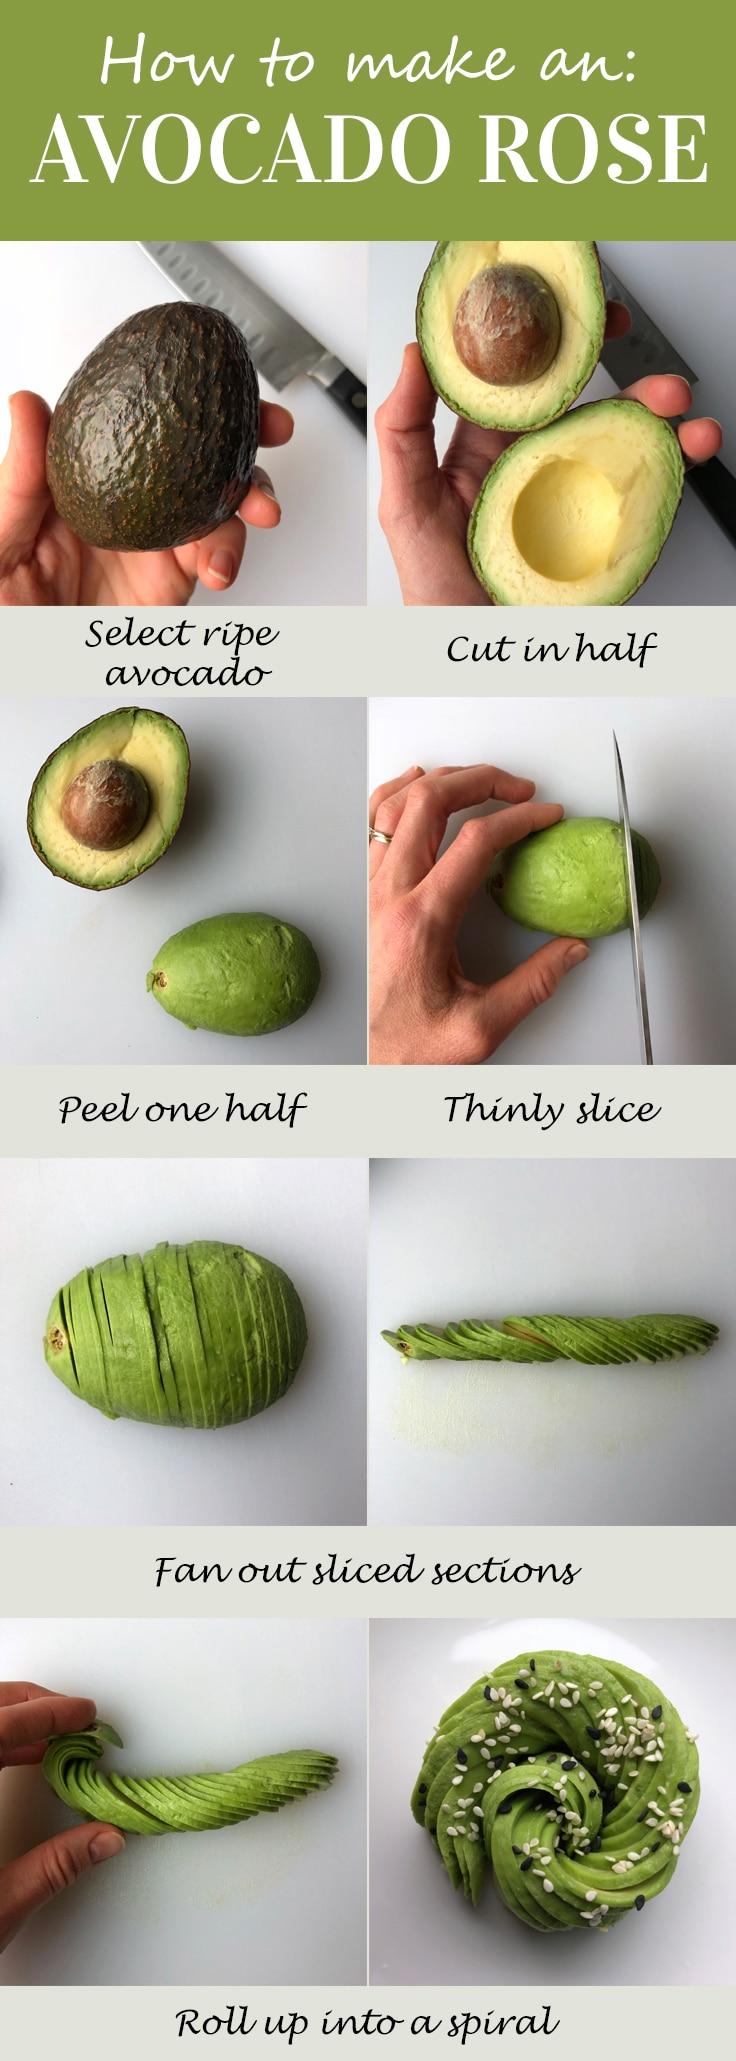 how to make an avocado rose pinterest image